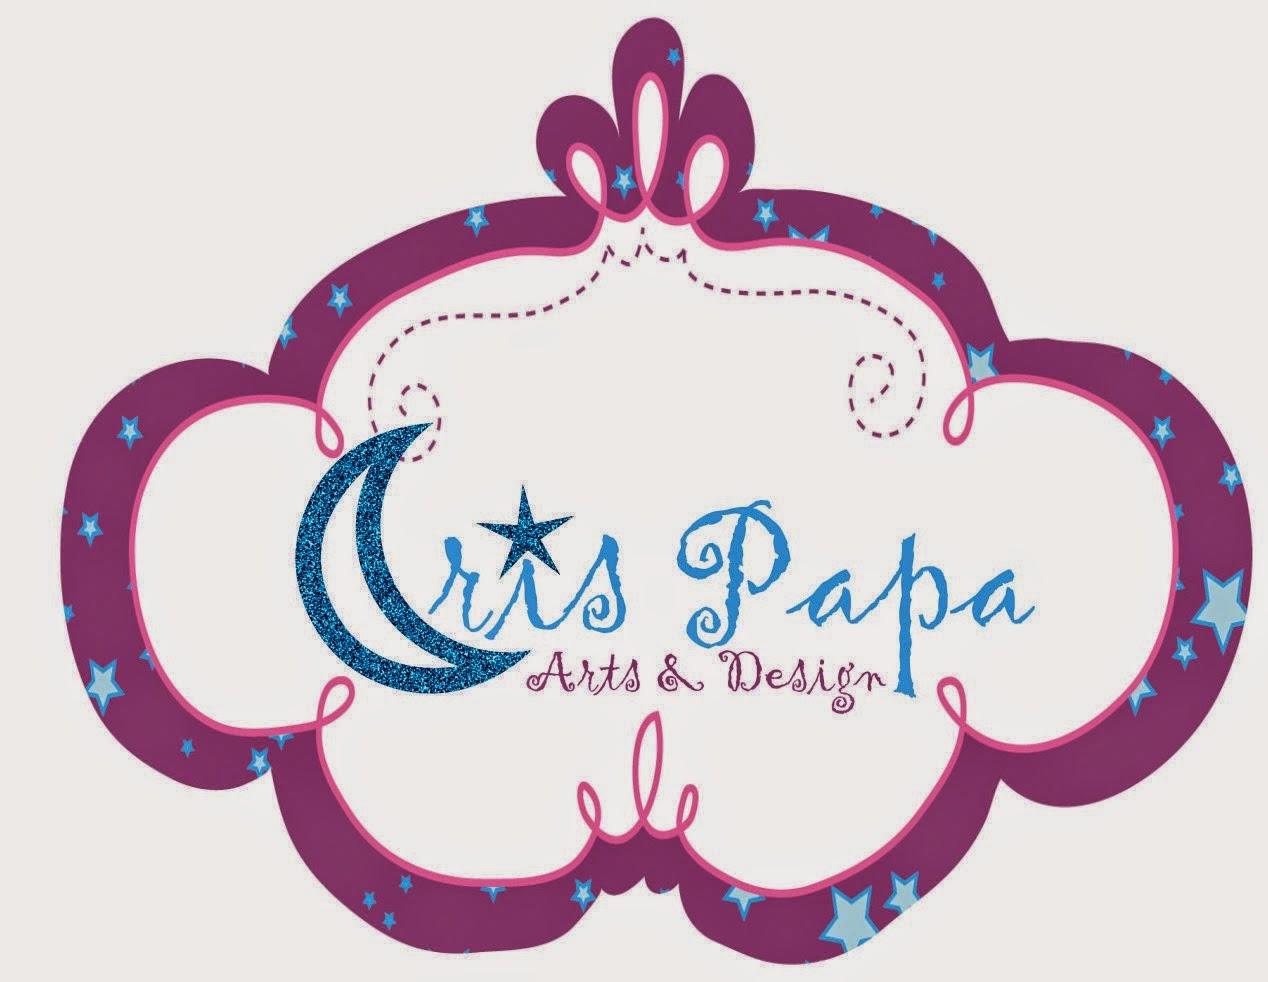 Cris Papa Arts & Design